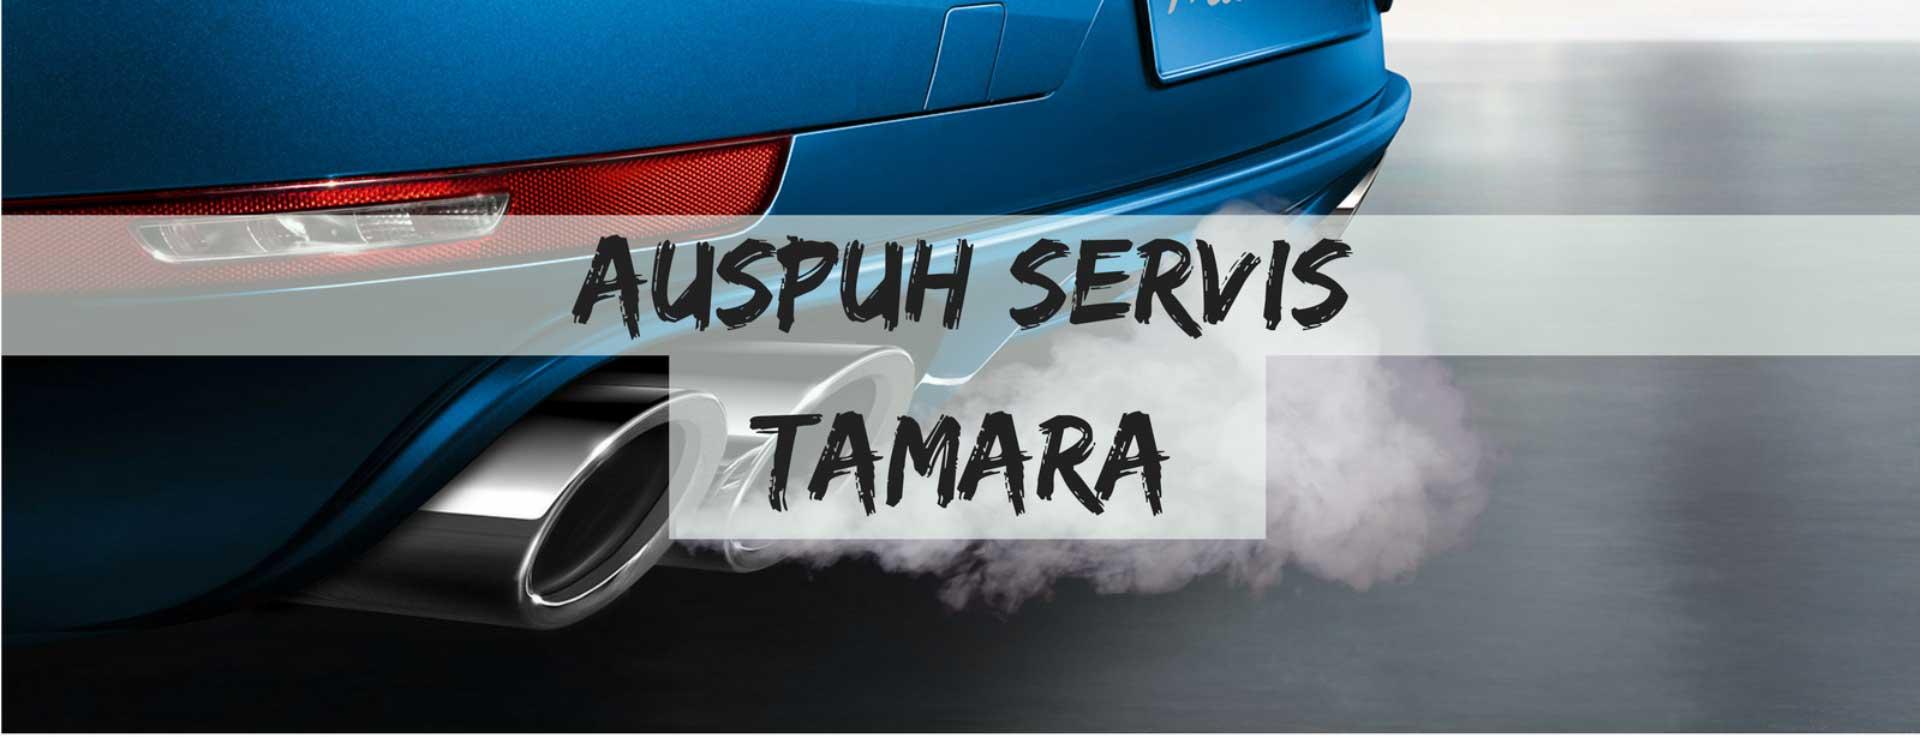 Auspuh Servis Tamara